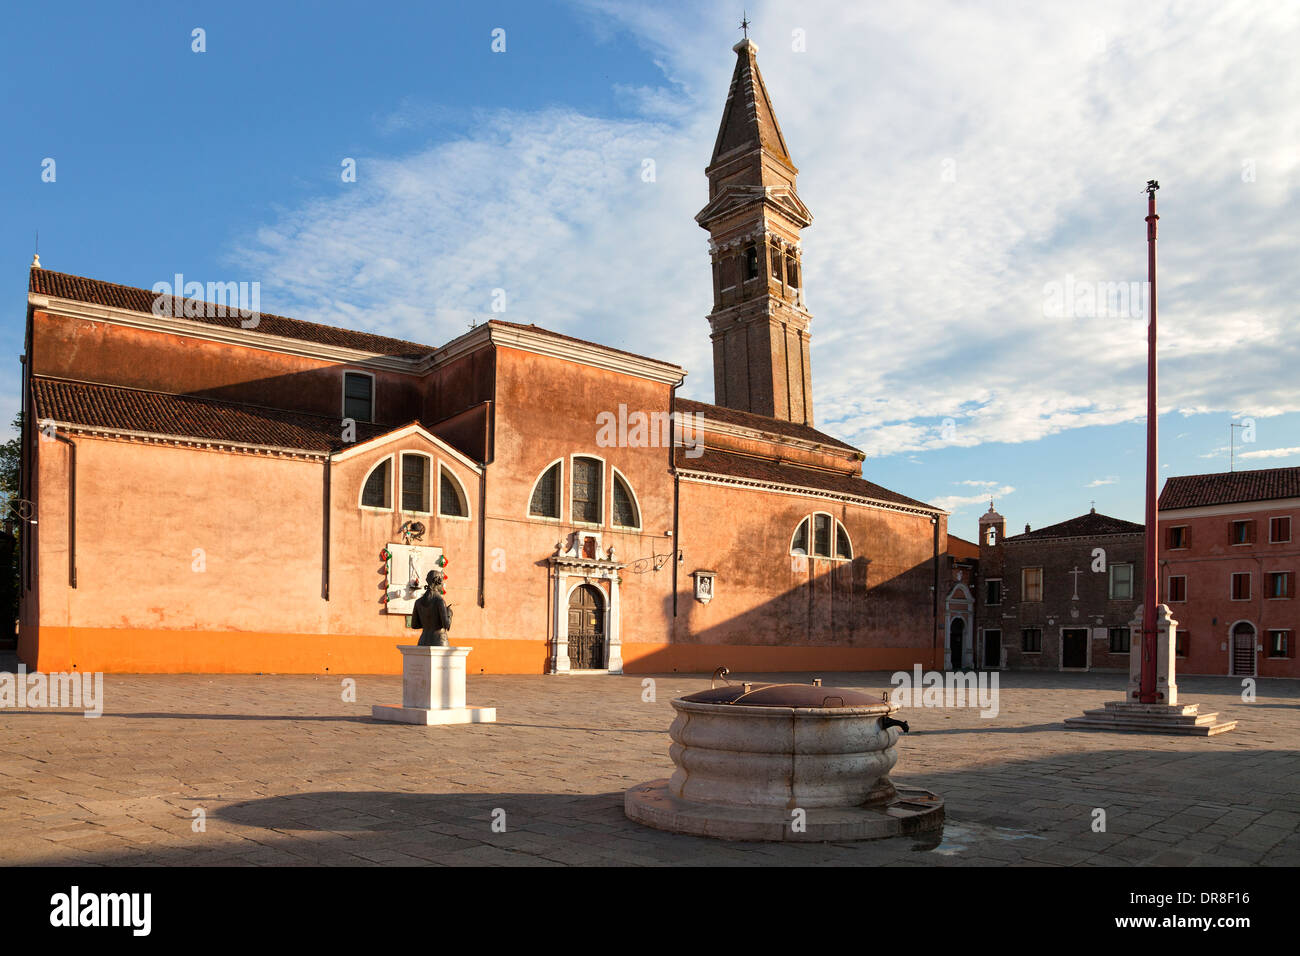 Burano, Venice - Piazza Baldassare Galuppi and tilting tower of the church San Martini on Burano, Italy; Chiesa di San Martini - Stock Image